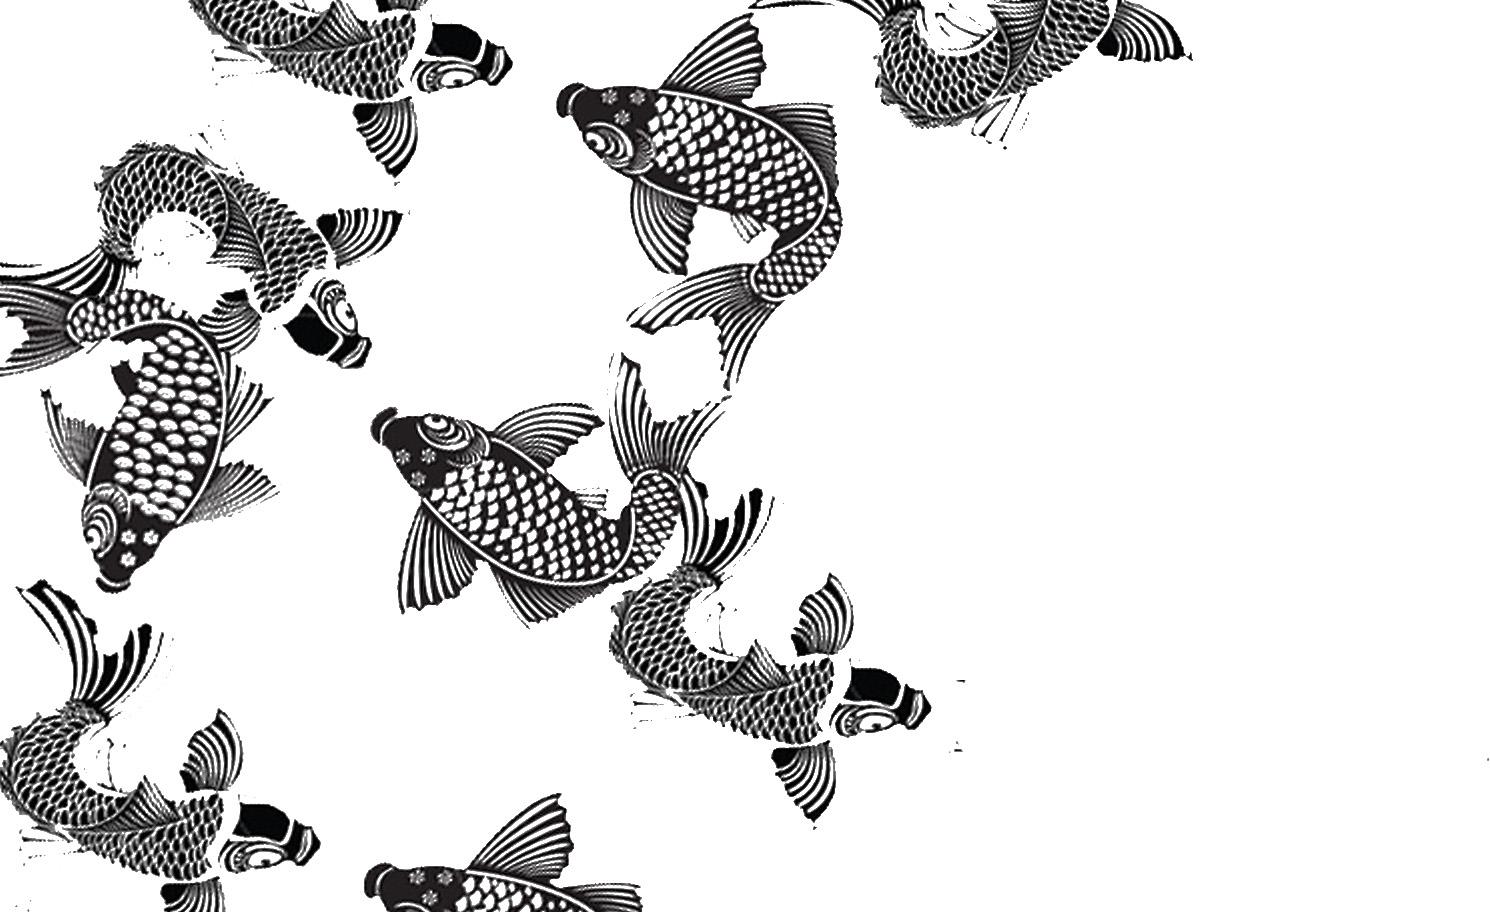 fish art pattern widescreen